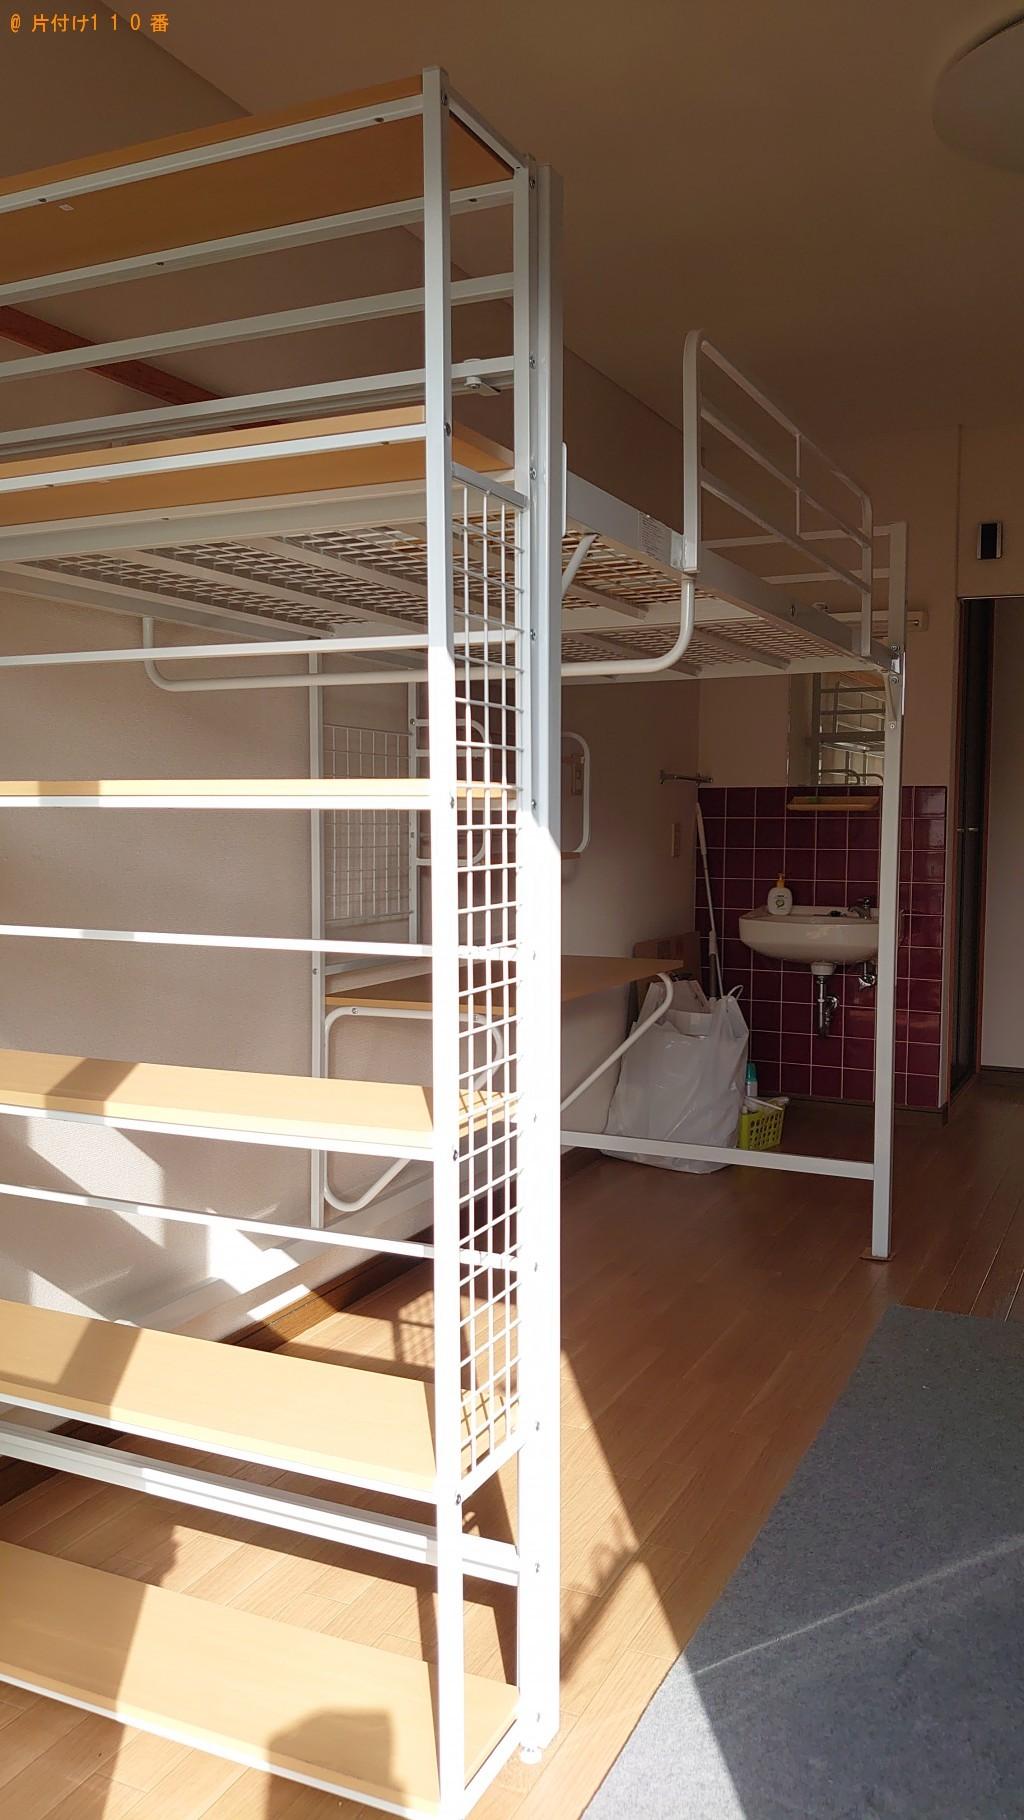 【高松市出作町】冷蔵庫、炊飯器、洗濯機、電子レンジの回収・処分